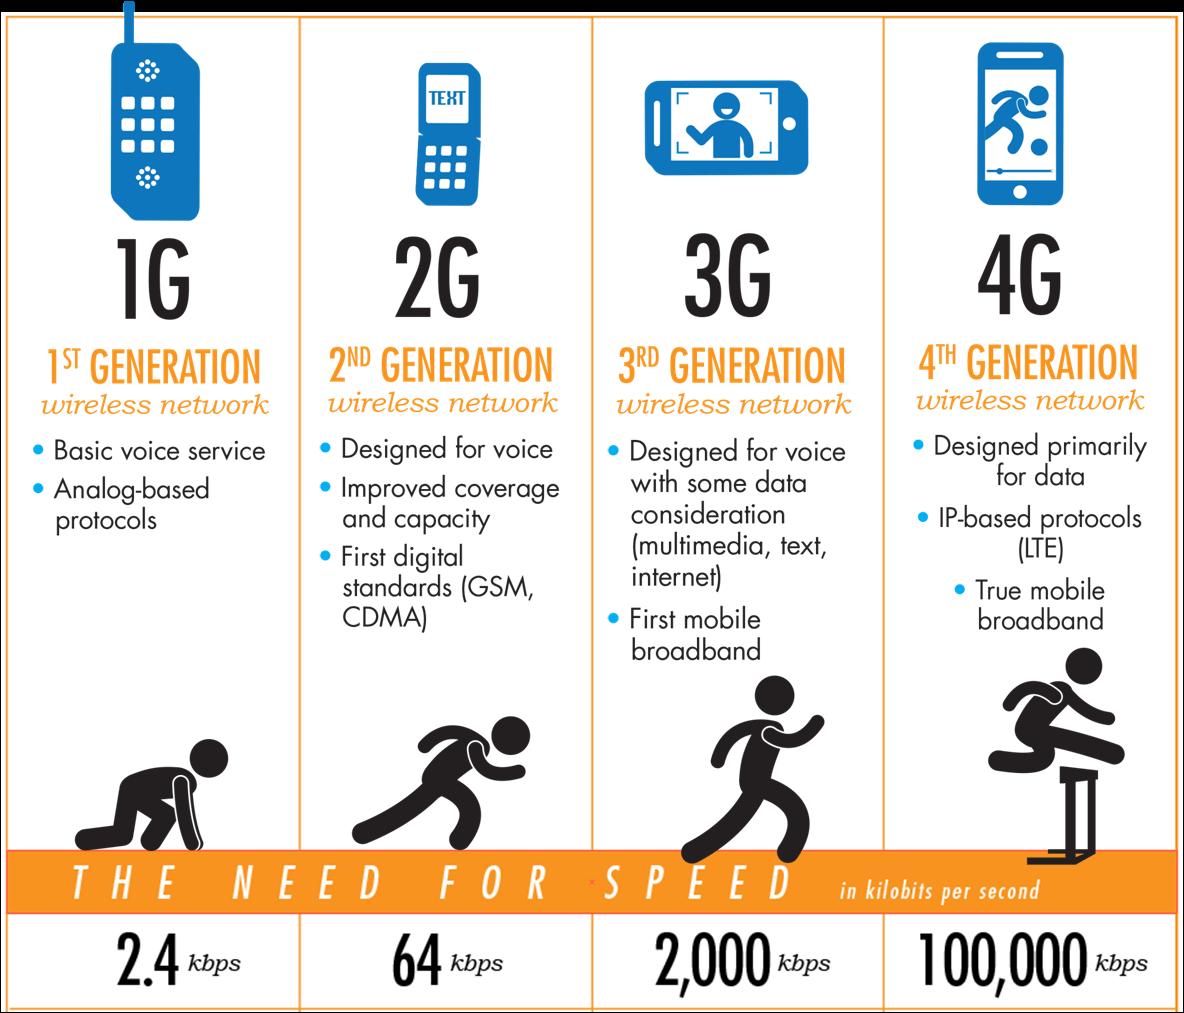 mobile evolution 1g 2g 3g 4g [ 1184 x 1013 Pixel ]